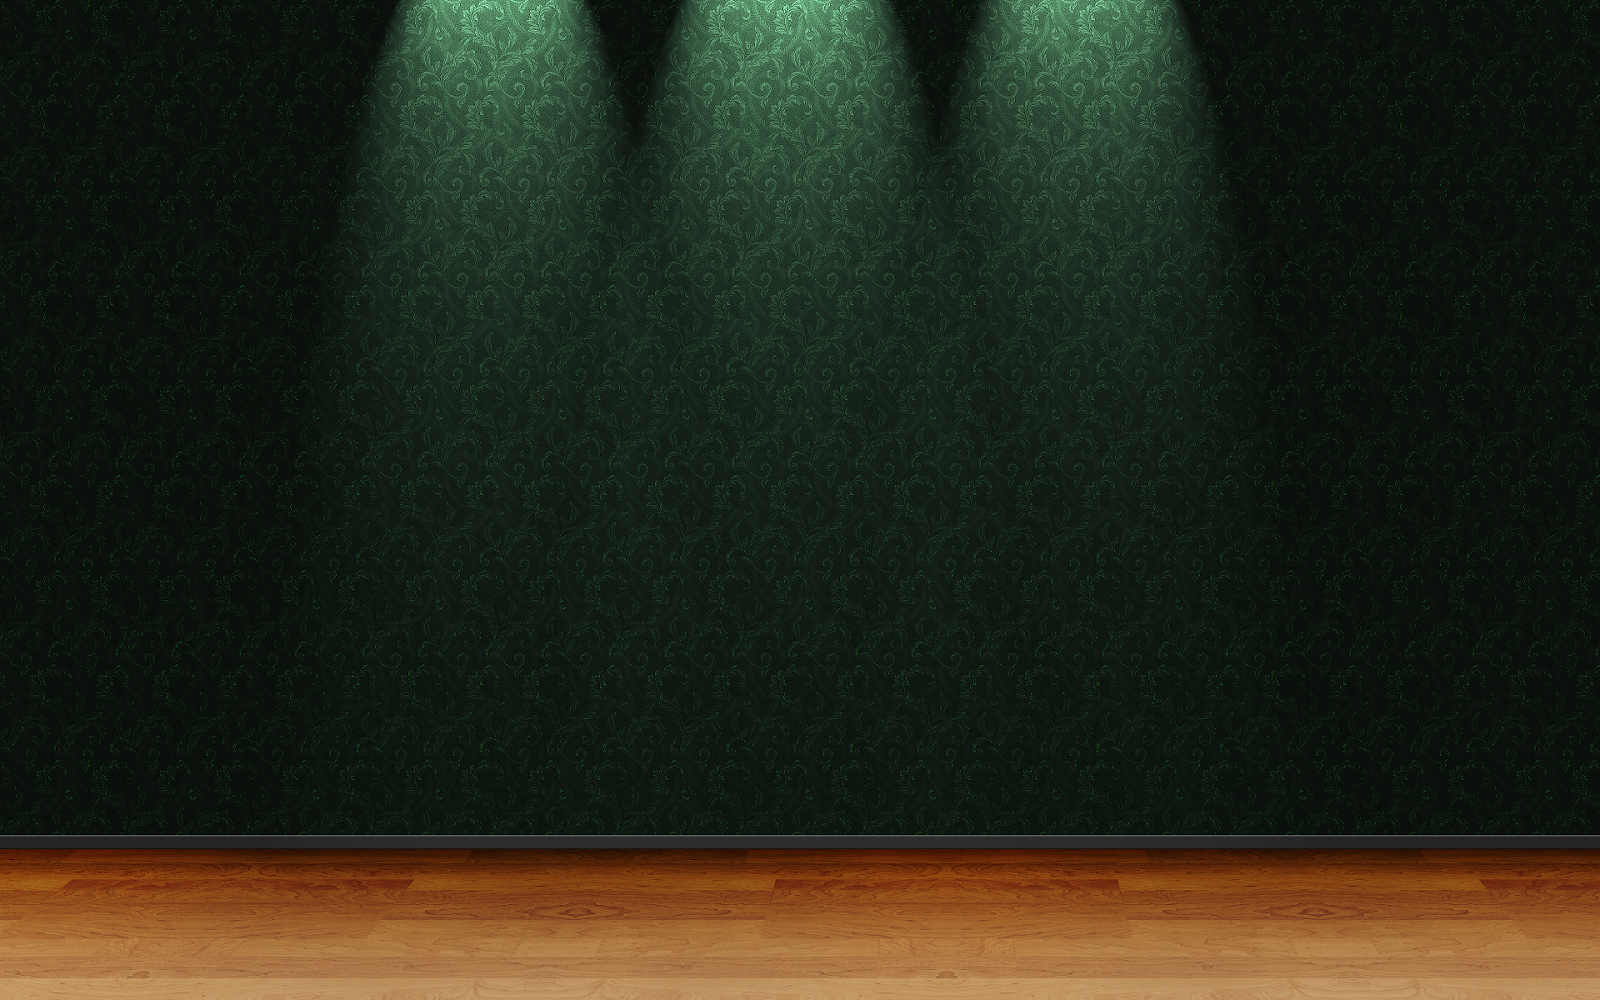 Dramatic Lighting Room PSD - Luckystudio4u